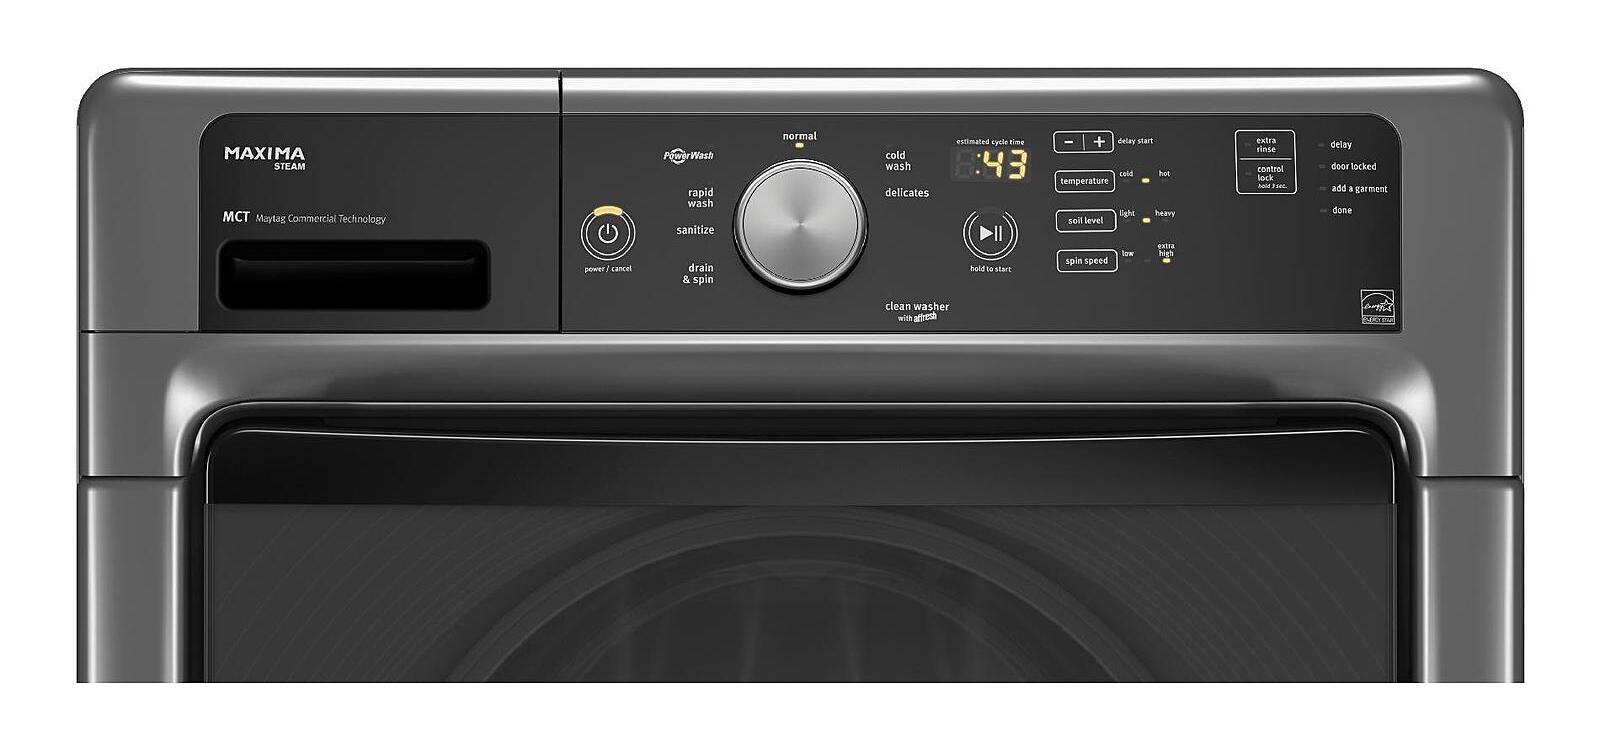 Maytag Maxima Mhw8100dc Maytag Heritage Washing Machine